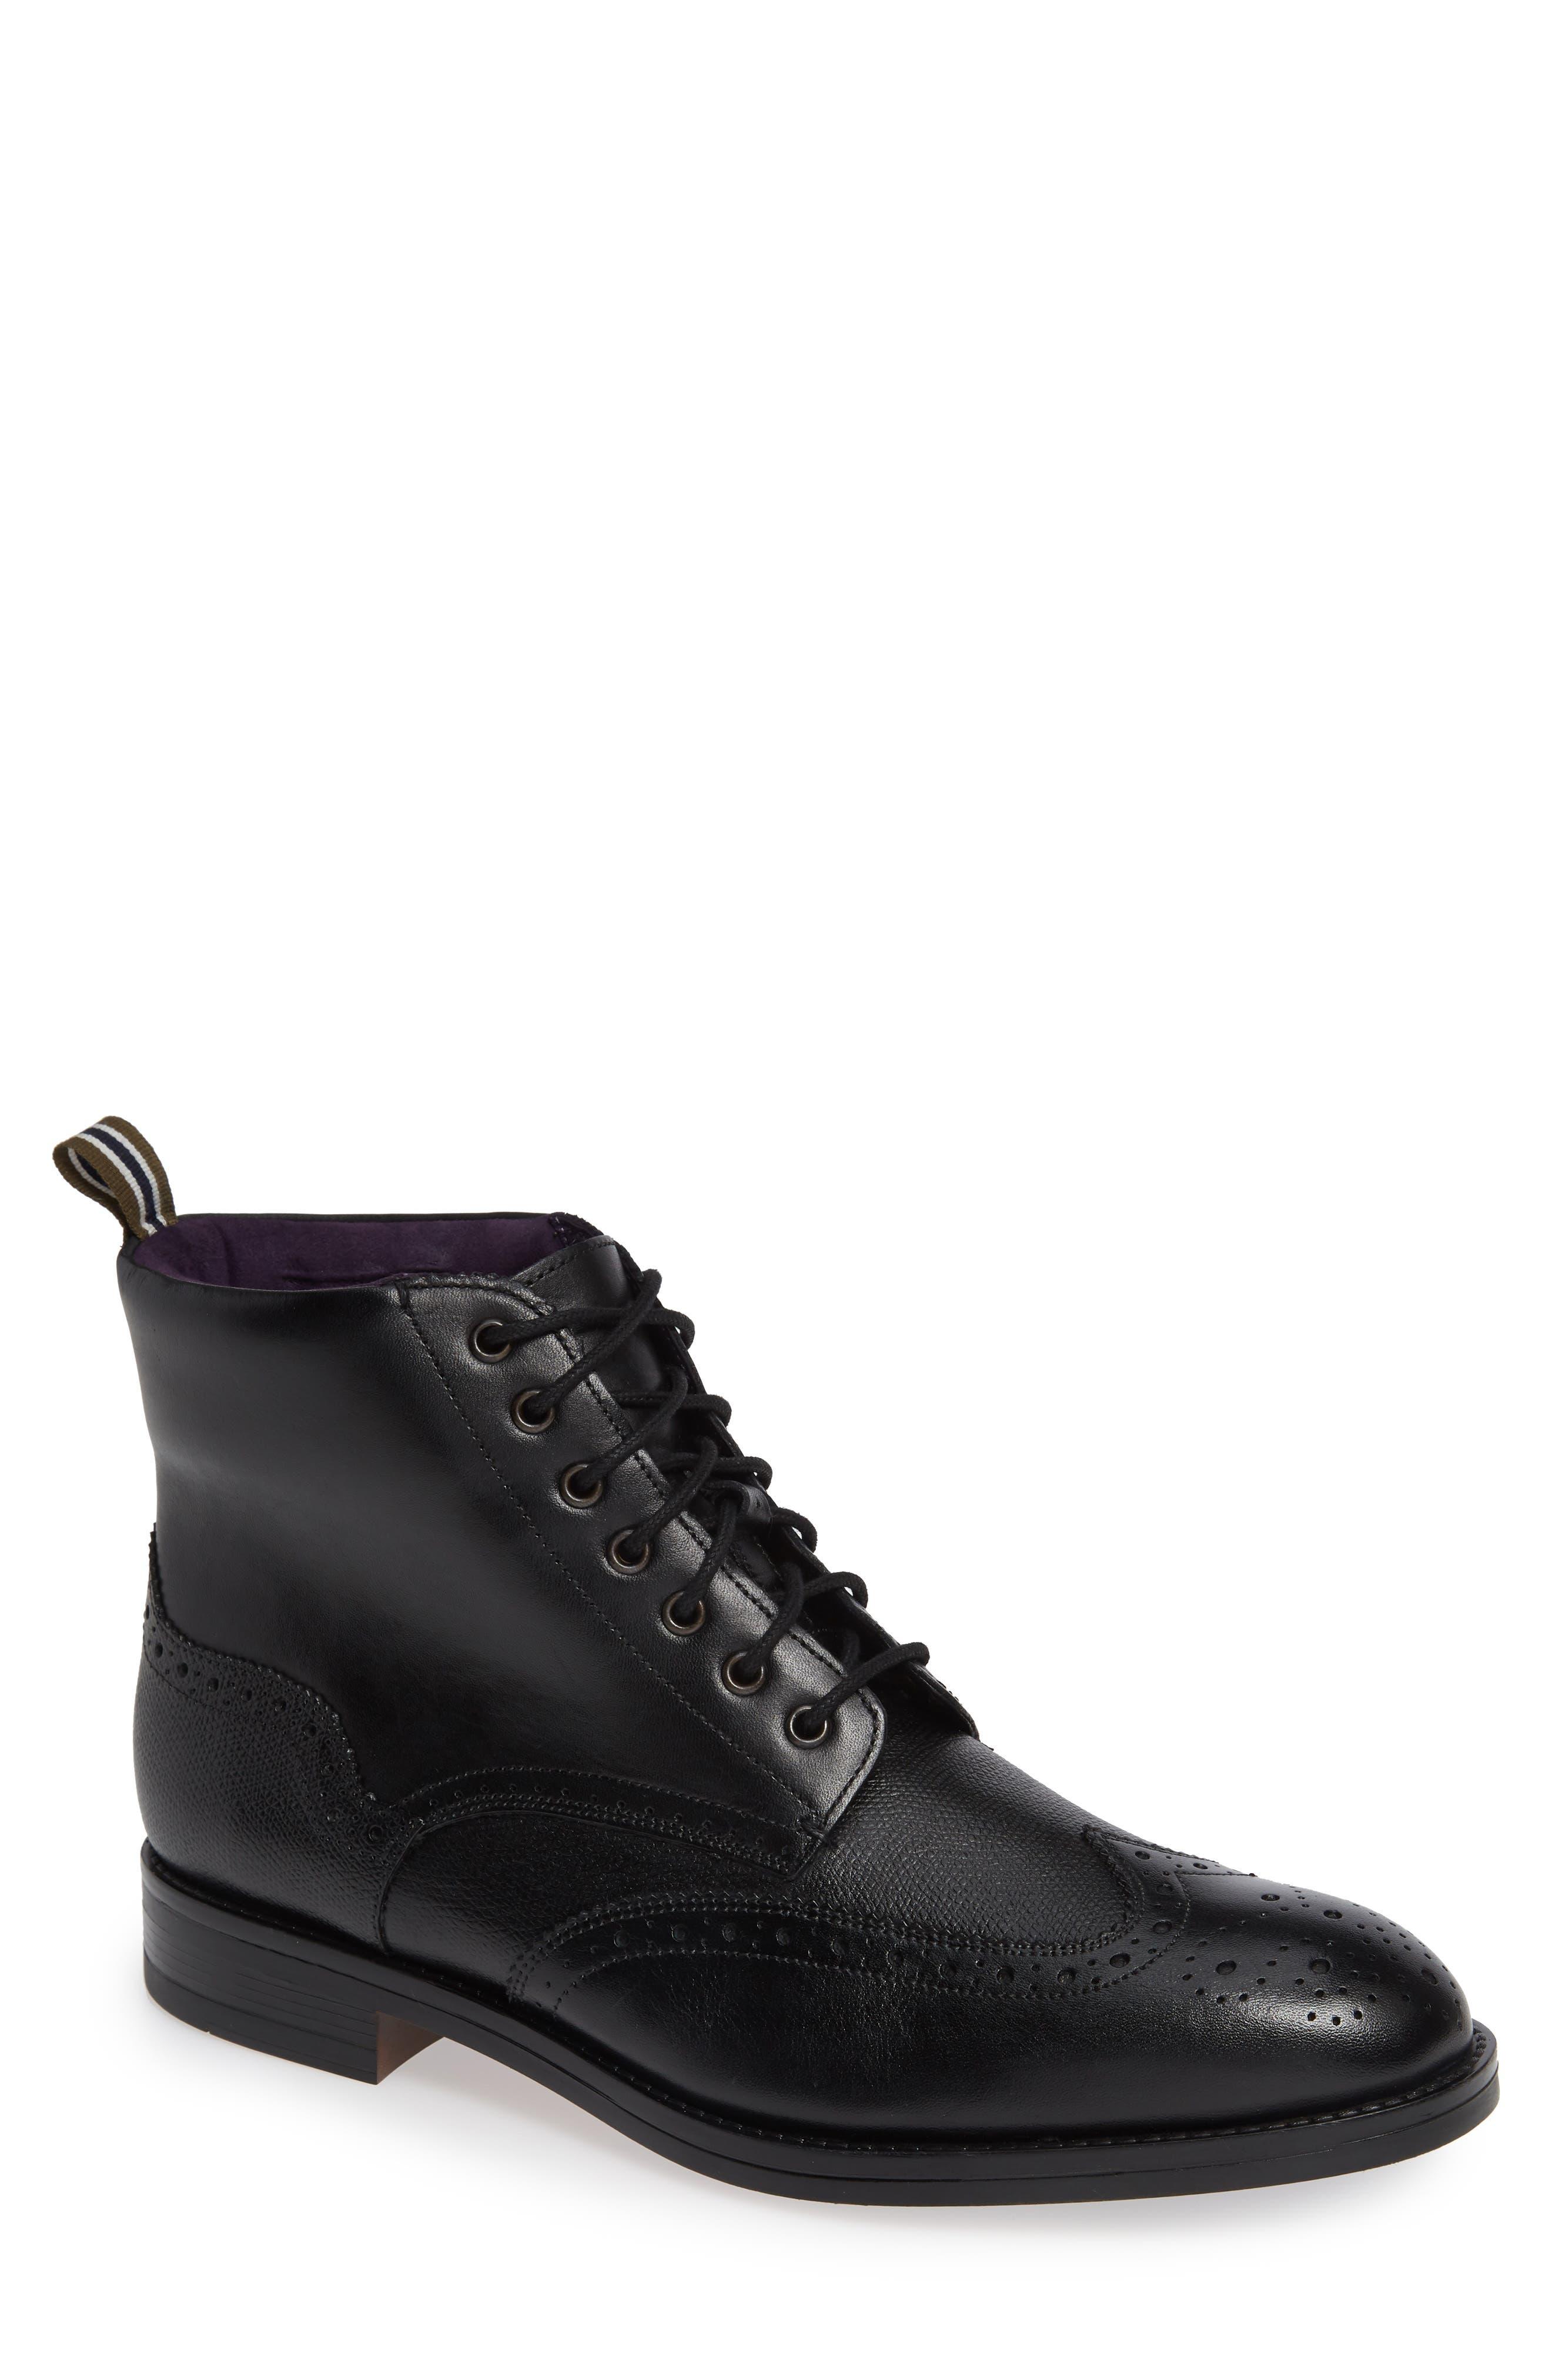 Ted Baker London Twrens Wingtip Boot, Black